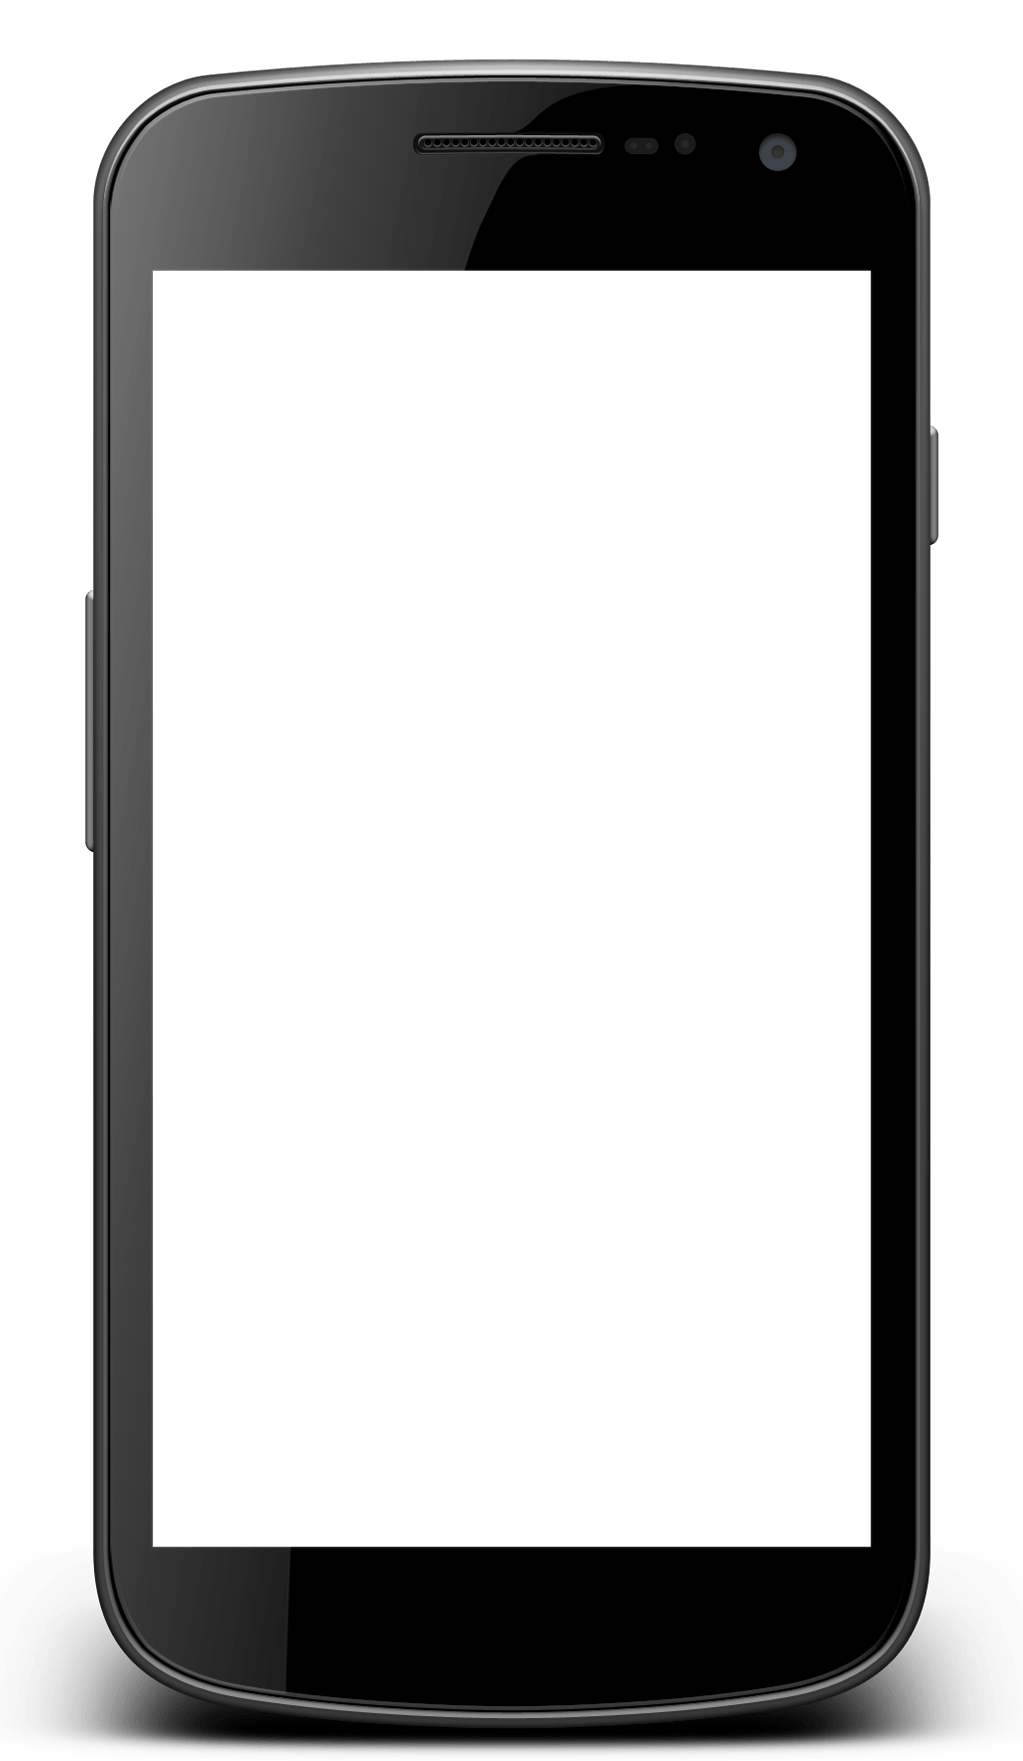 Phone hand phone